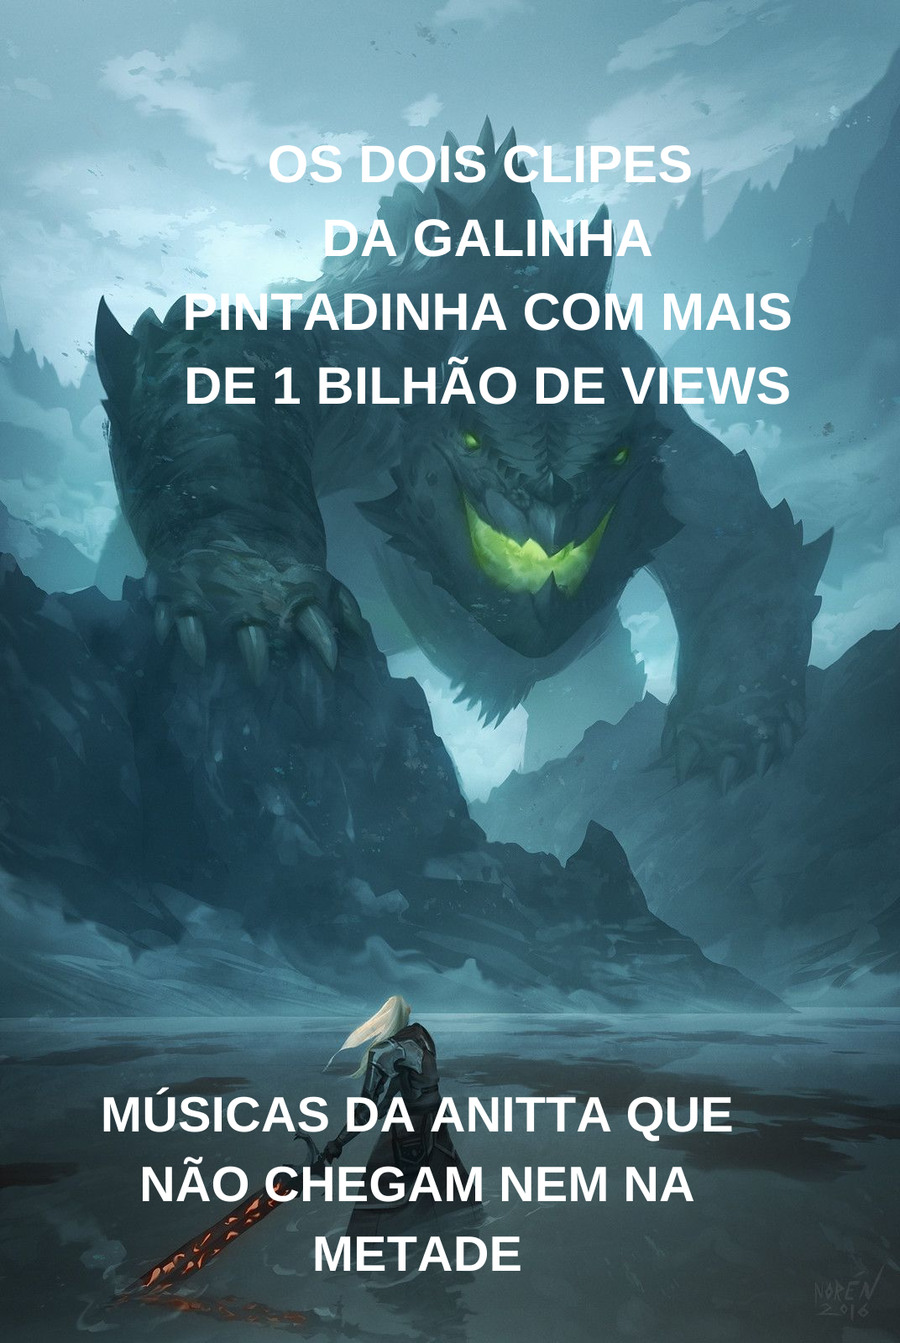 Upa Cavalinho - meme